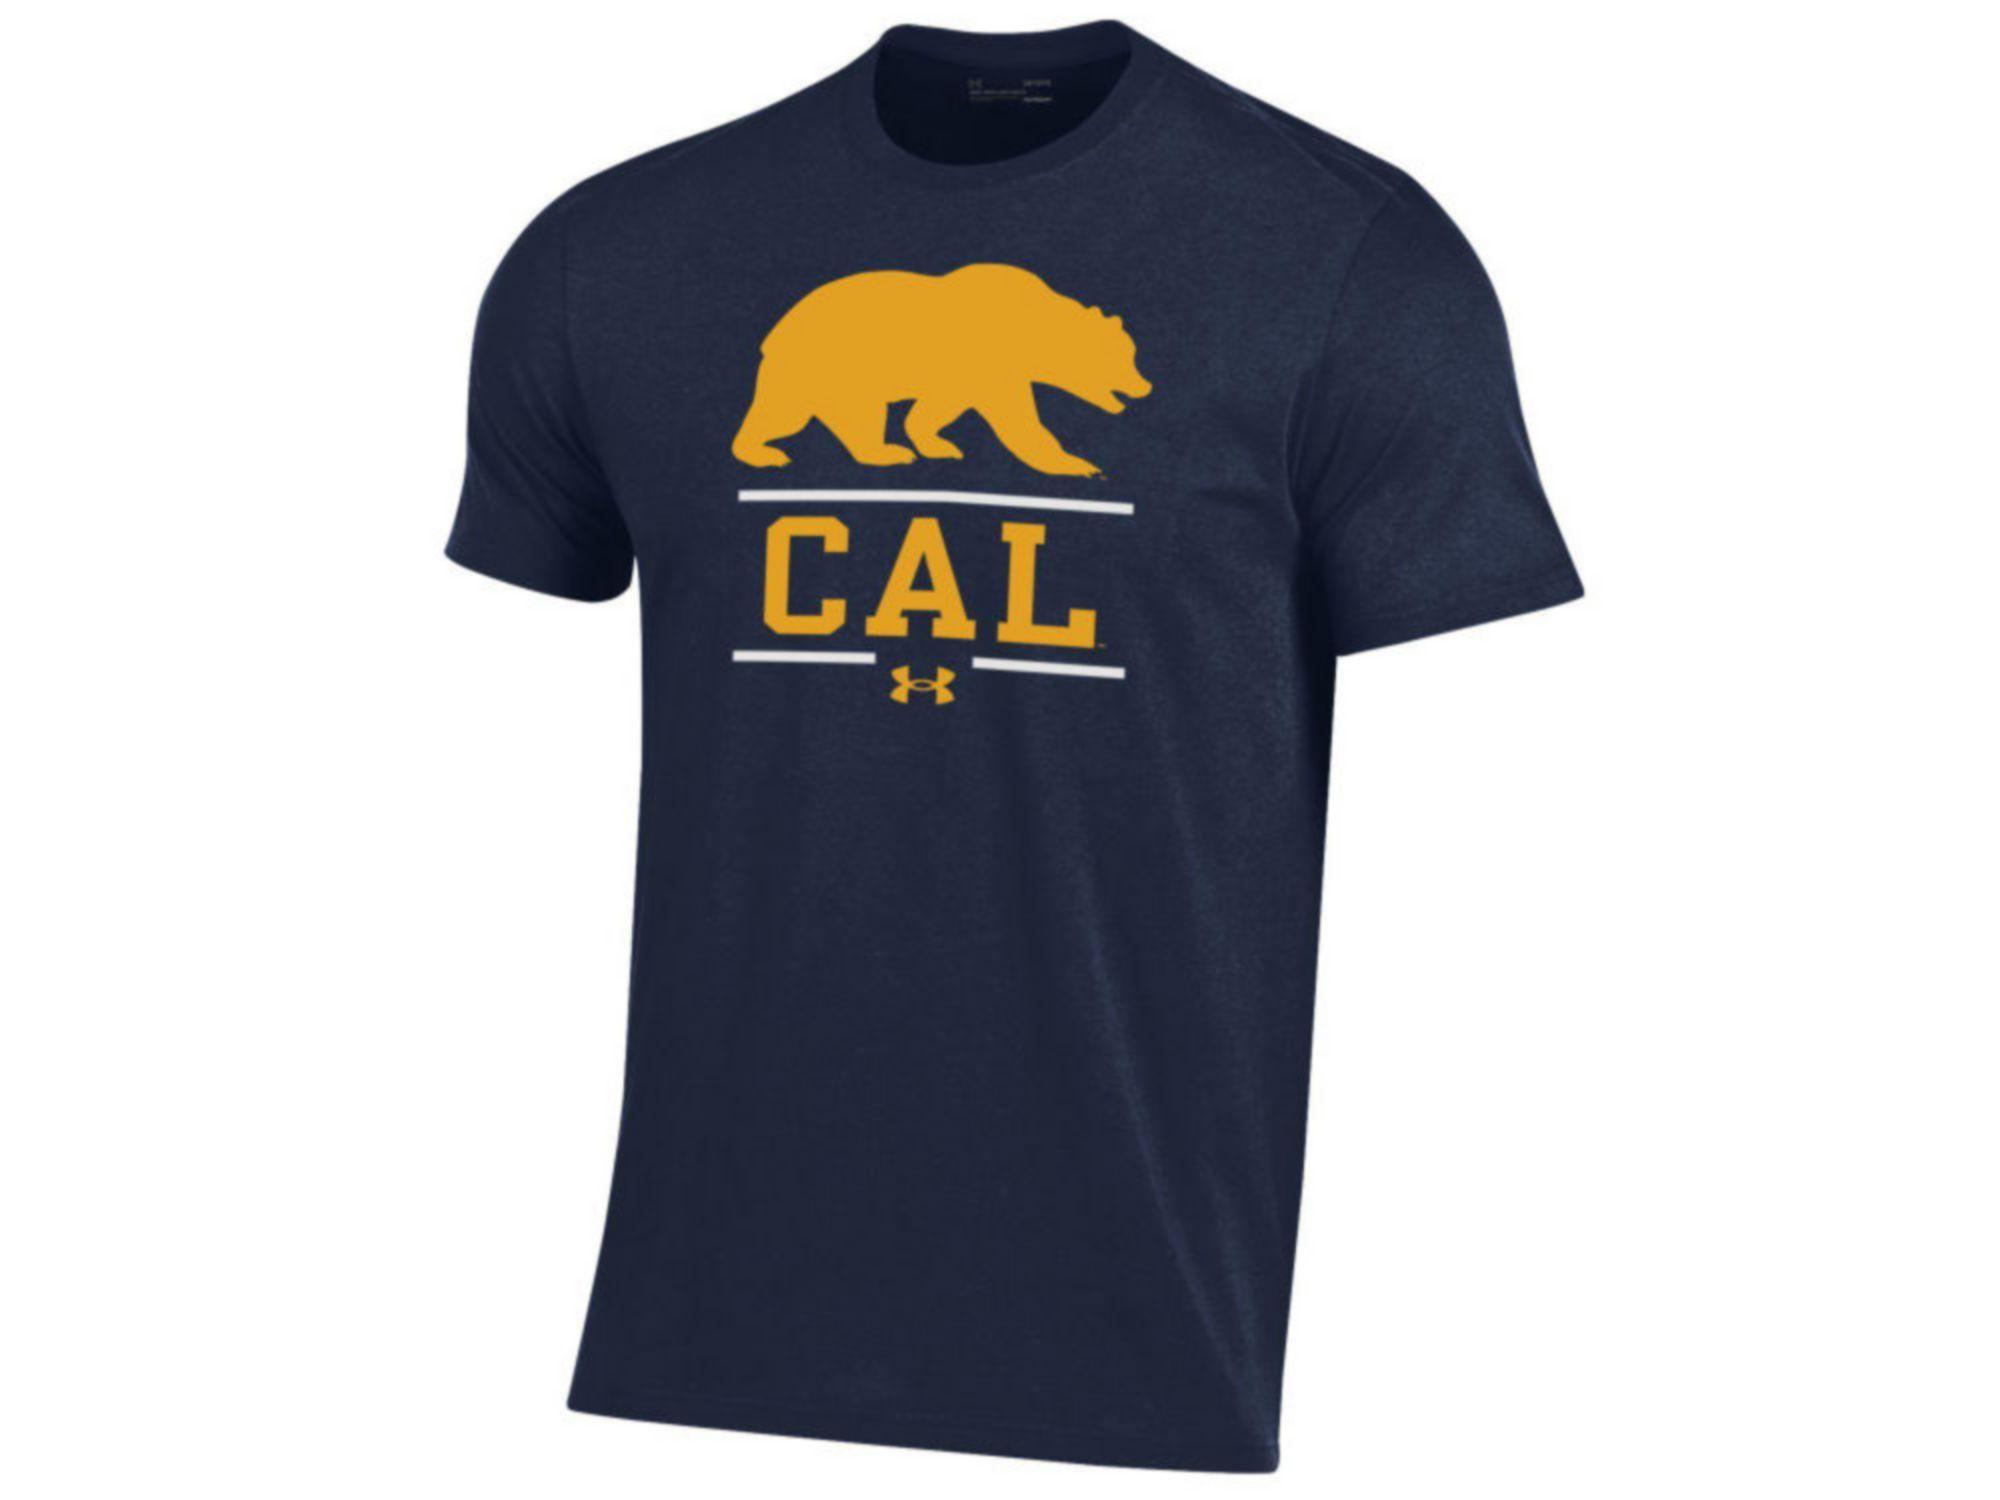 Under Armour Men's University of California Golden Bears Performance Cotton T-Shirt & Reviews - NCAA - Sports Fan Shop - Macy's